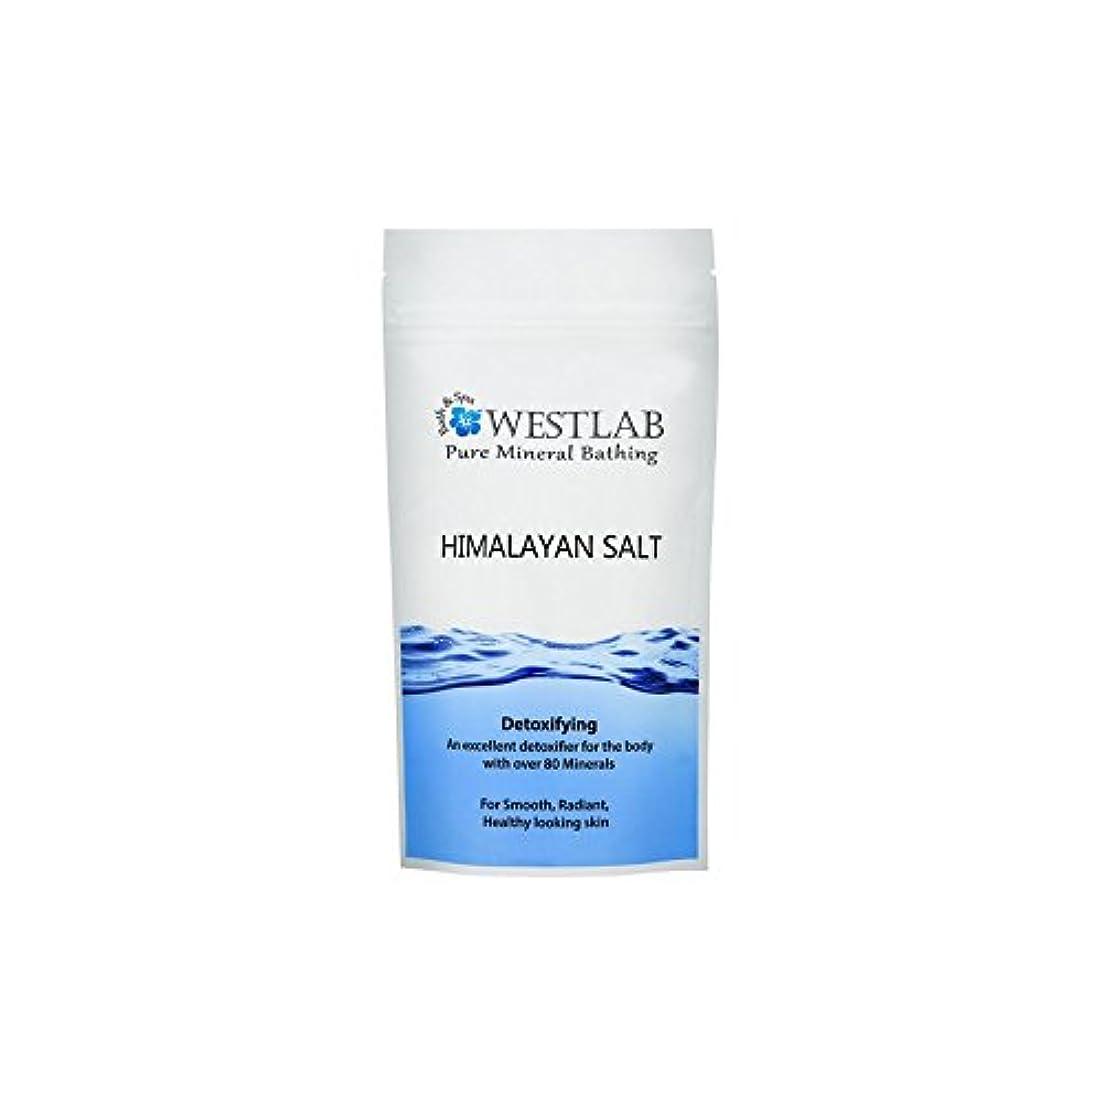 Westlab Himalayan Salt 500g - ヒマラヤの塩500グラム [並行輸入品]